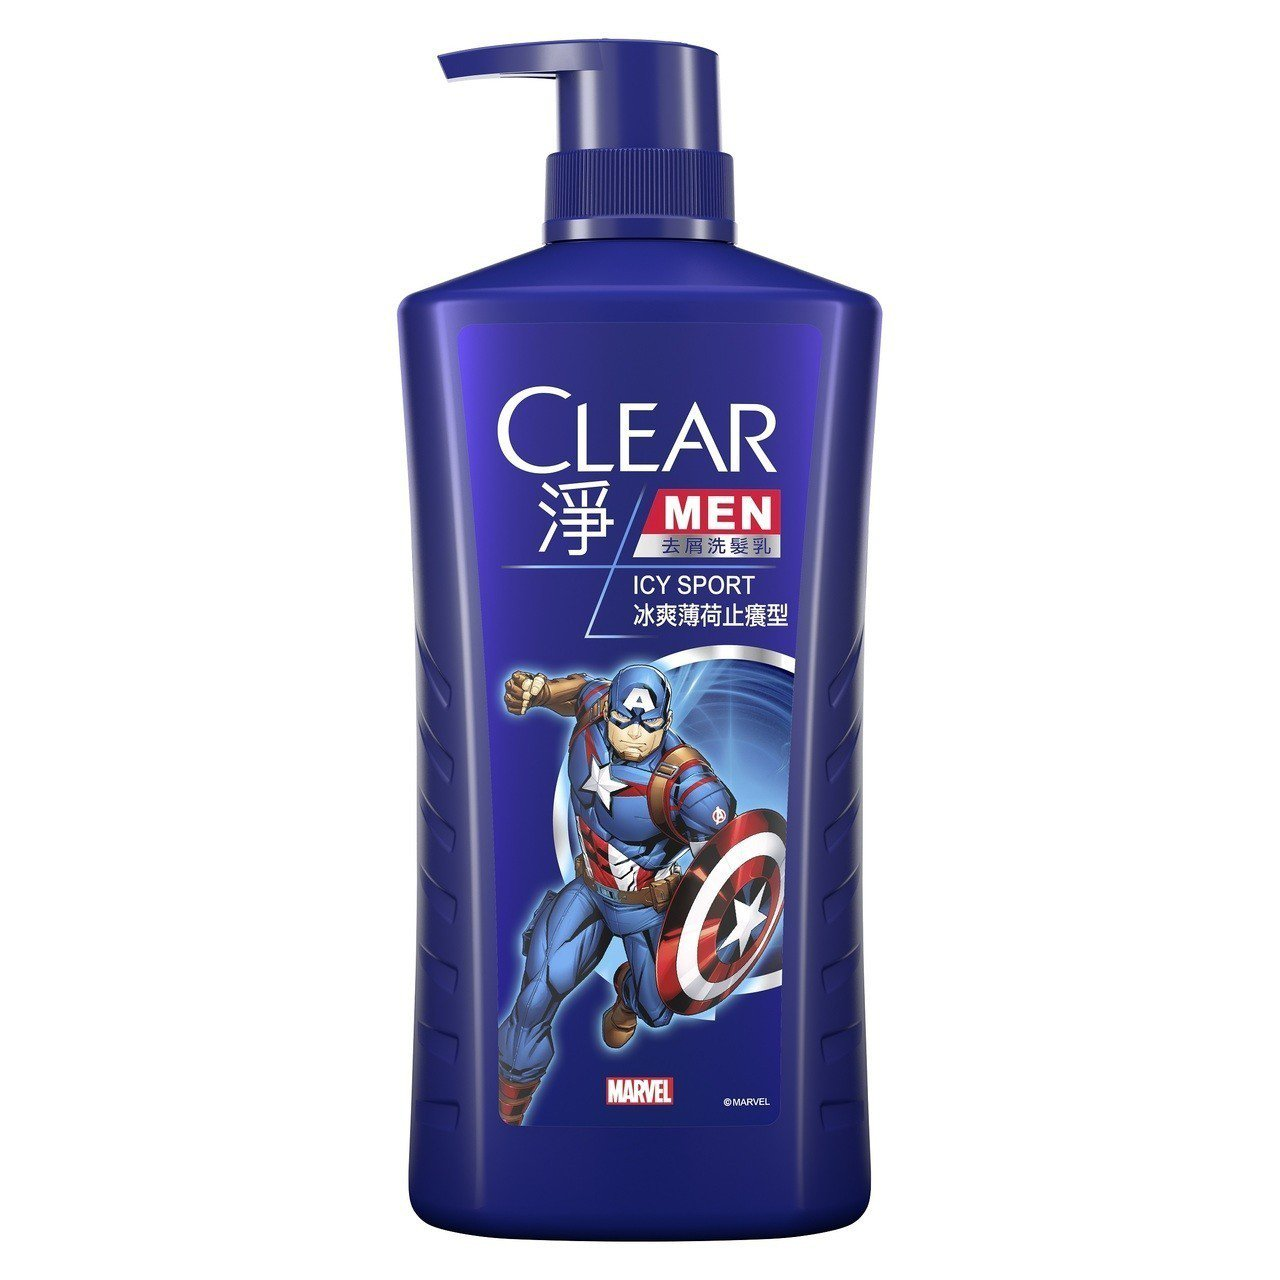 CLEAR淨男士去屑洗髮乳冰爽薄荷止癢型「美國隊長版」,750g售價299元。圖...